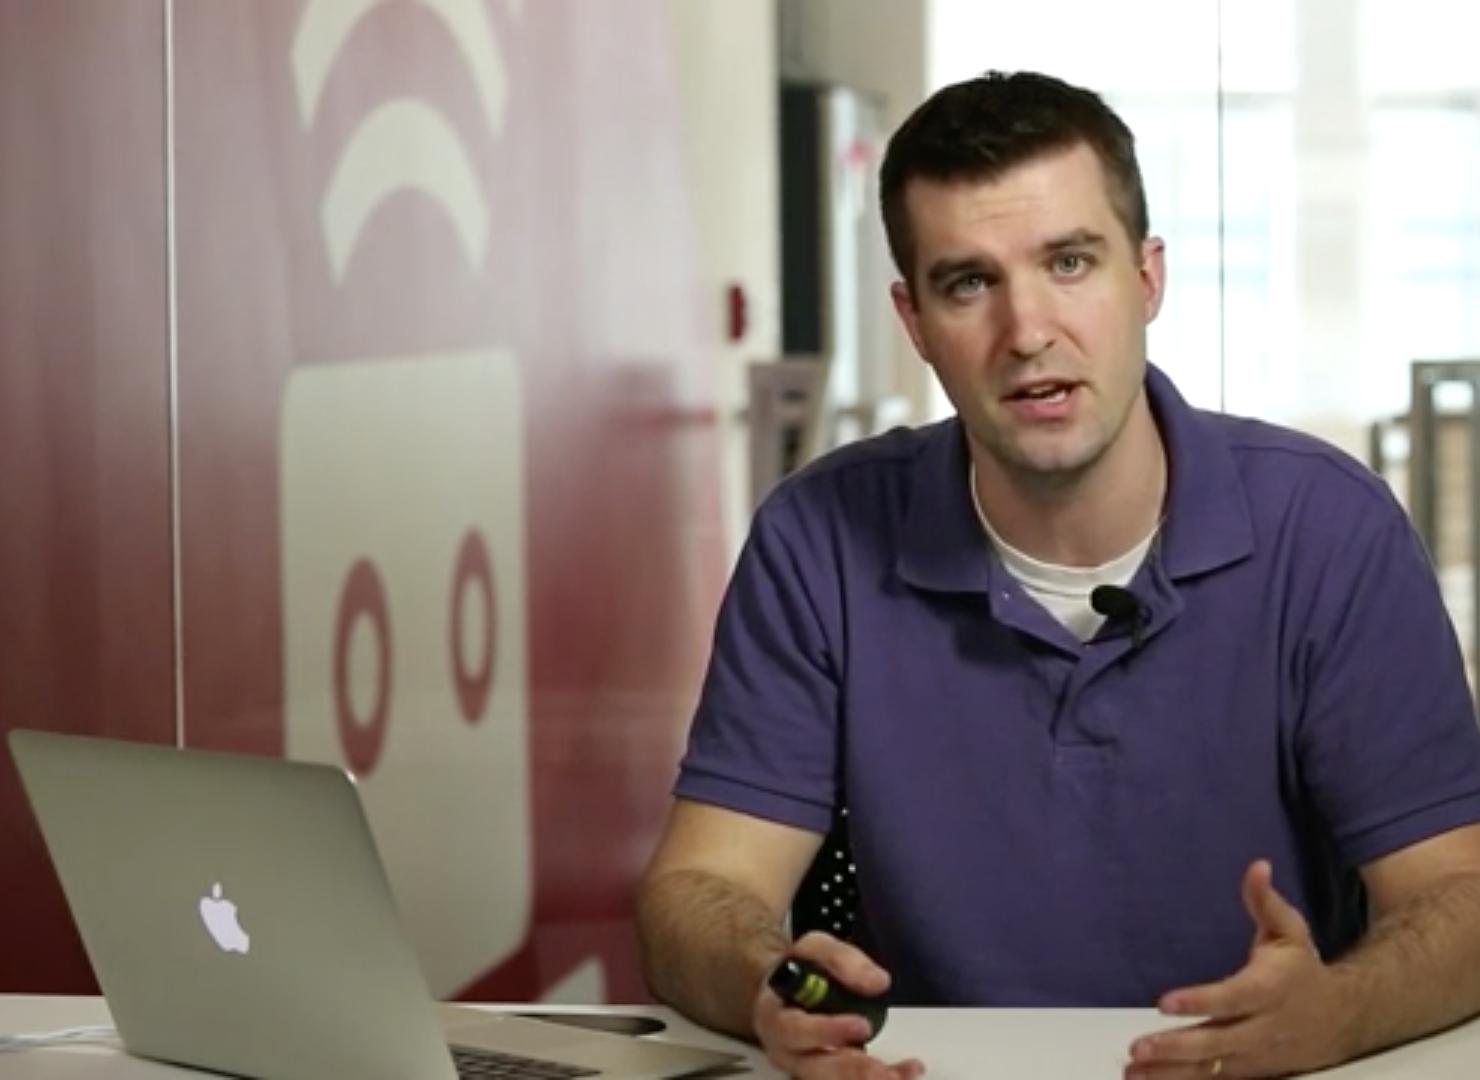 <p>Chad Pytel explains planning for building a web app</p>